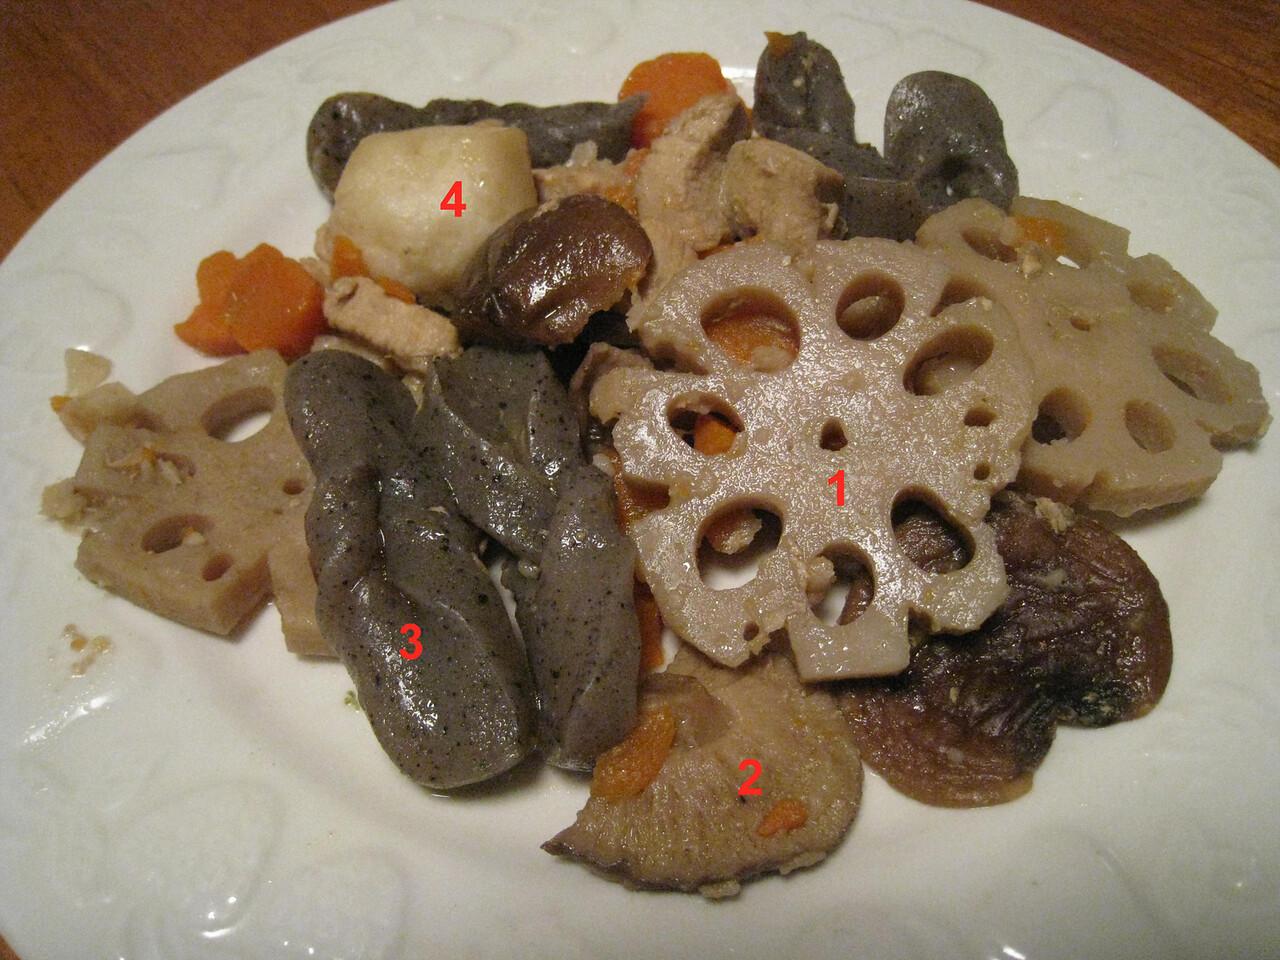 Japanese New Years Day Food 1) Renkon 蓮根 - Lotus Flower Root. 2) Shiitake 椎茸 - Shitake Mushroom 3) Konnyaku 蒟蒻 - Konjac (Voodoo Lilly Root)   4) Satoimo 里芋 - Taro Root